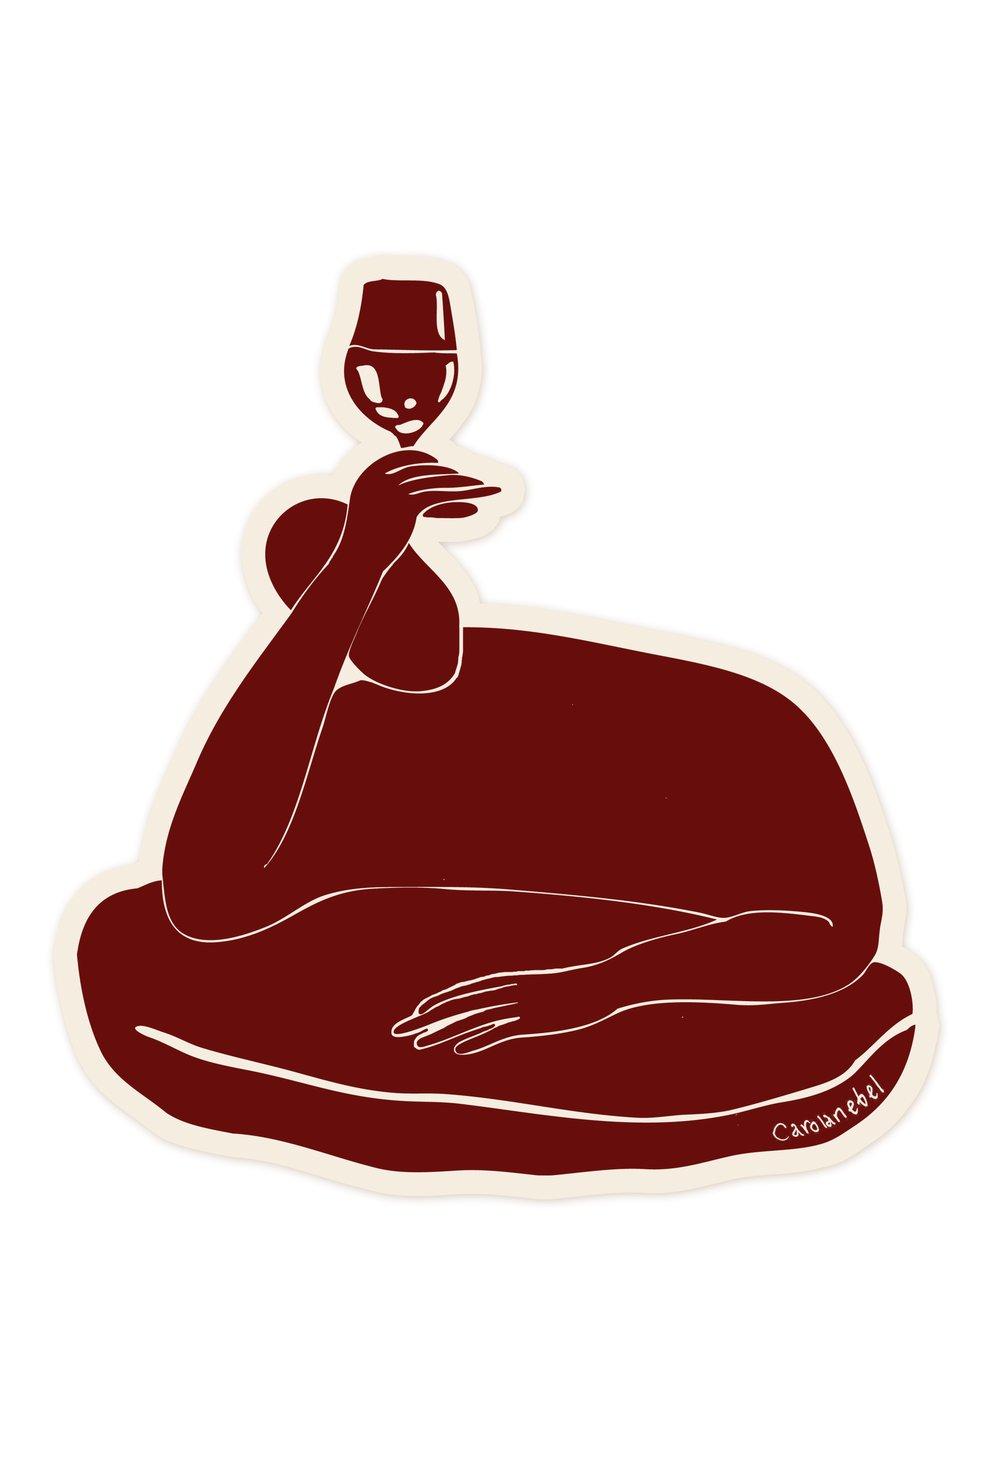 Image of Grand cru sticker